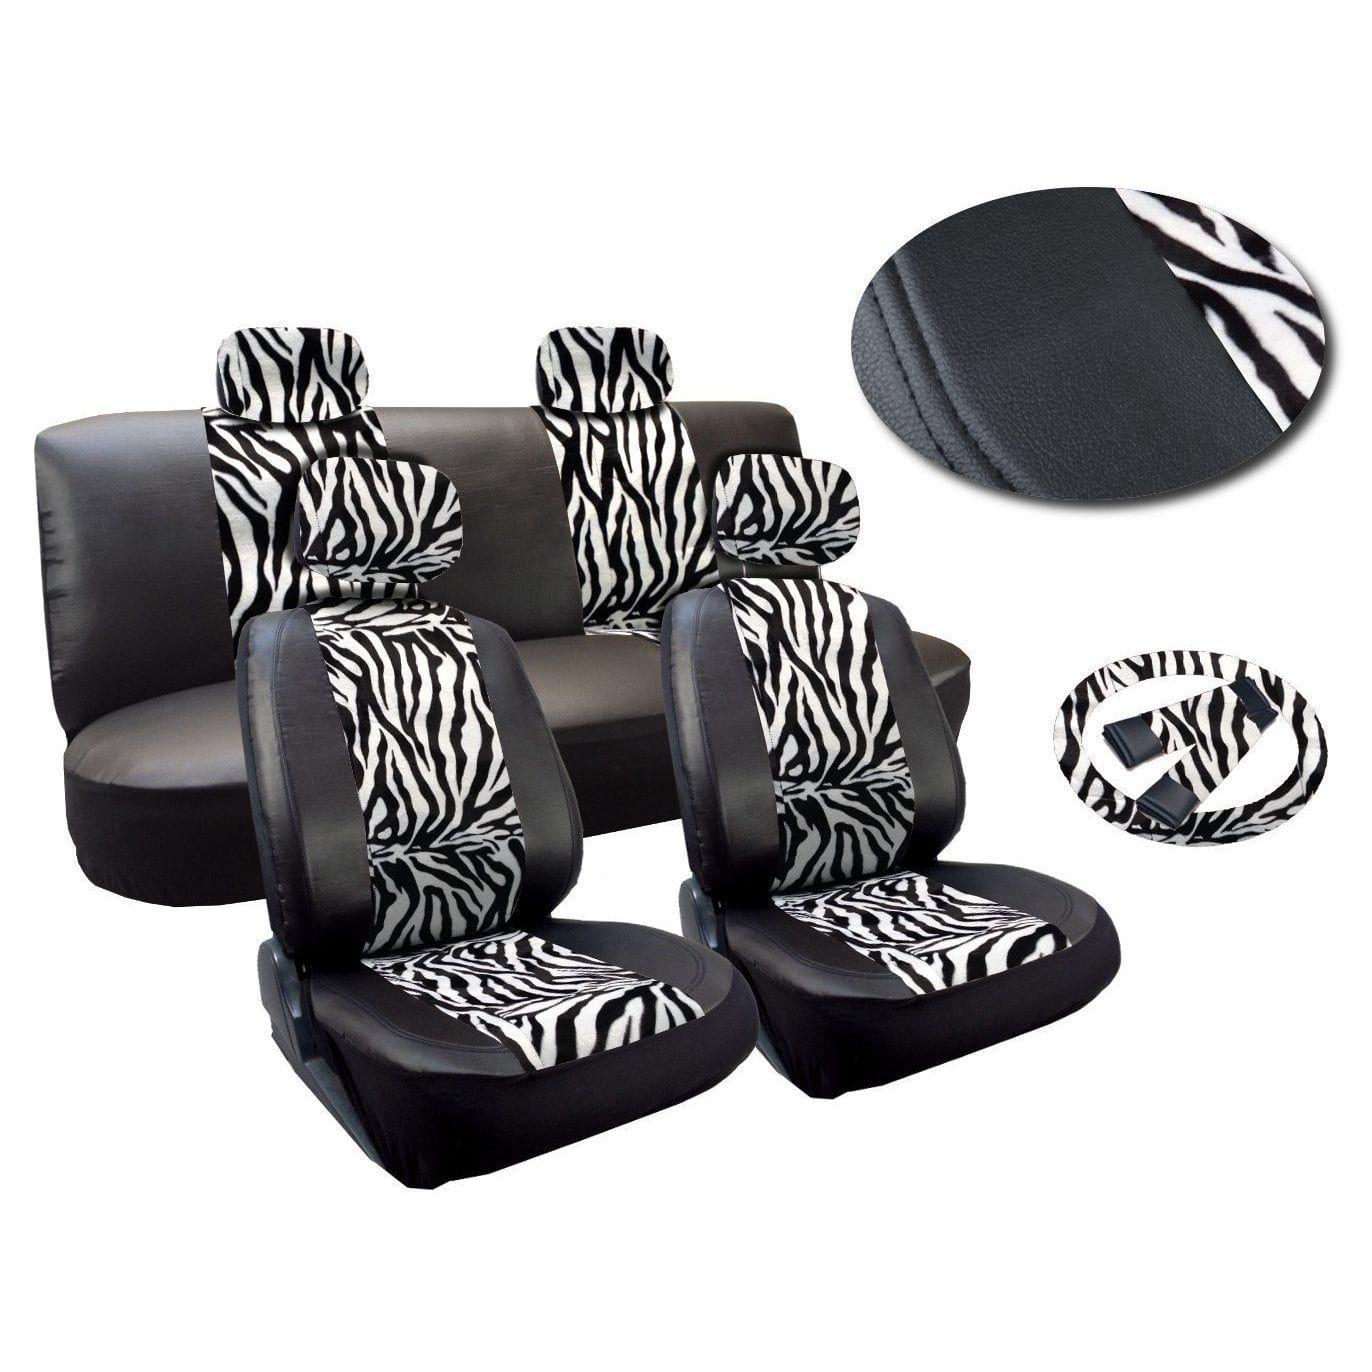 Unique 13 Piece Zebra Stripes Print Leatherette Seat Cover Set White